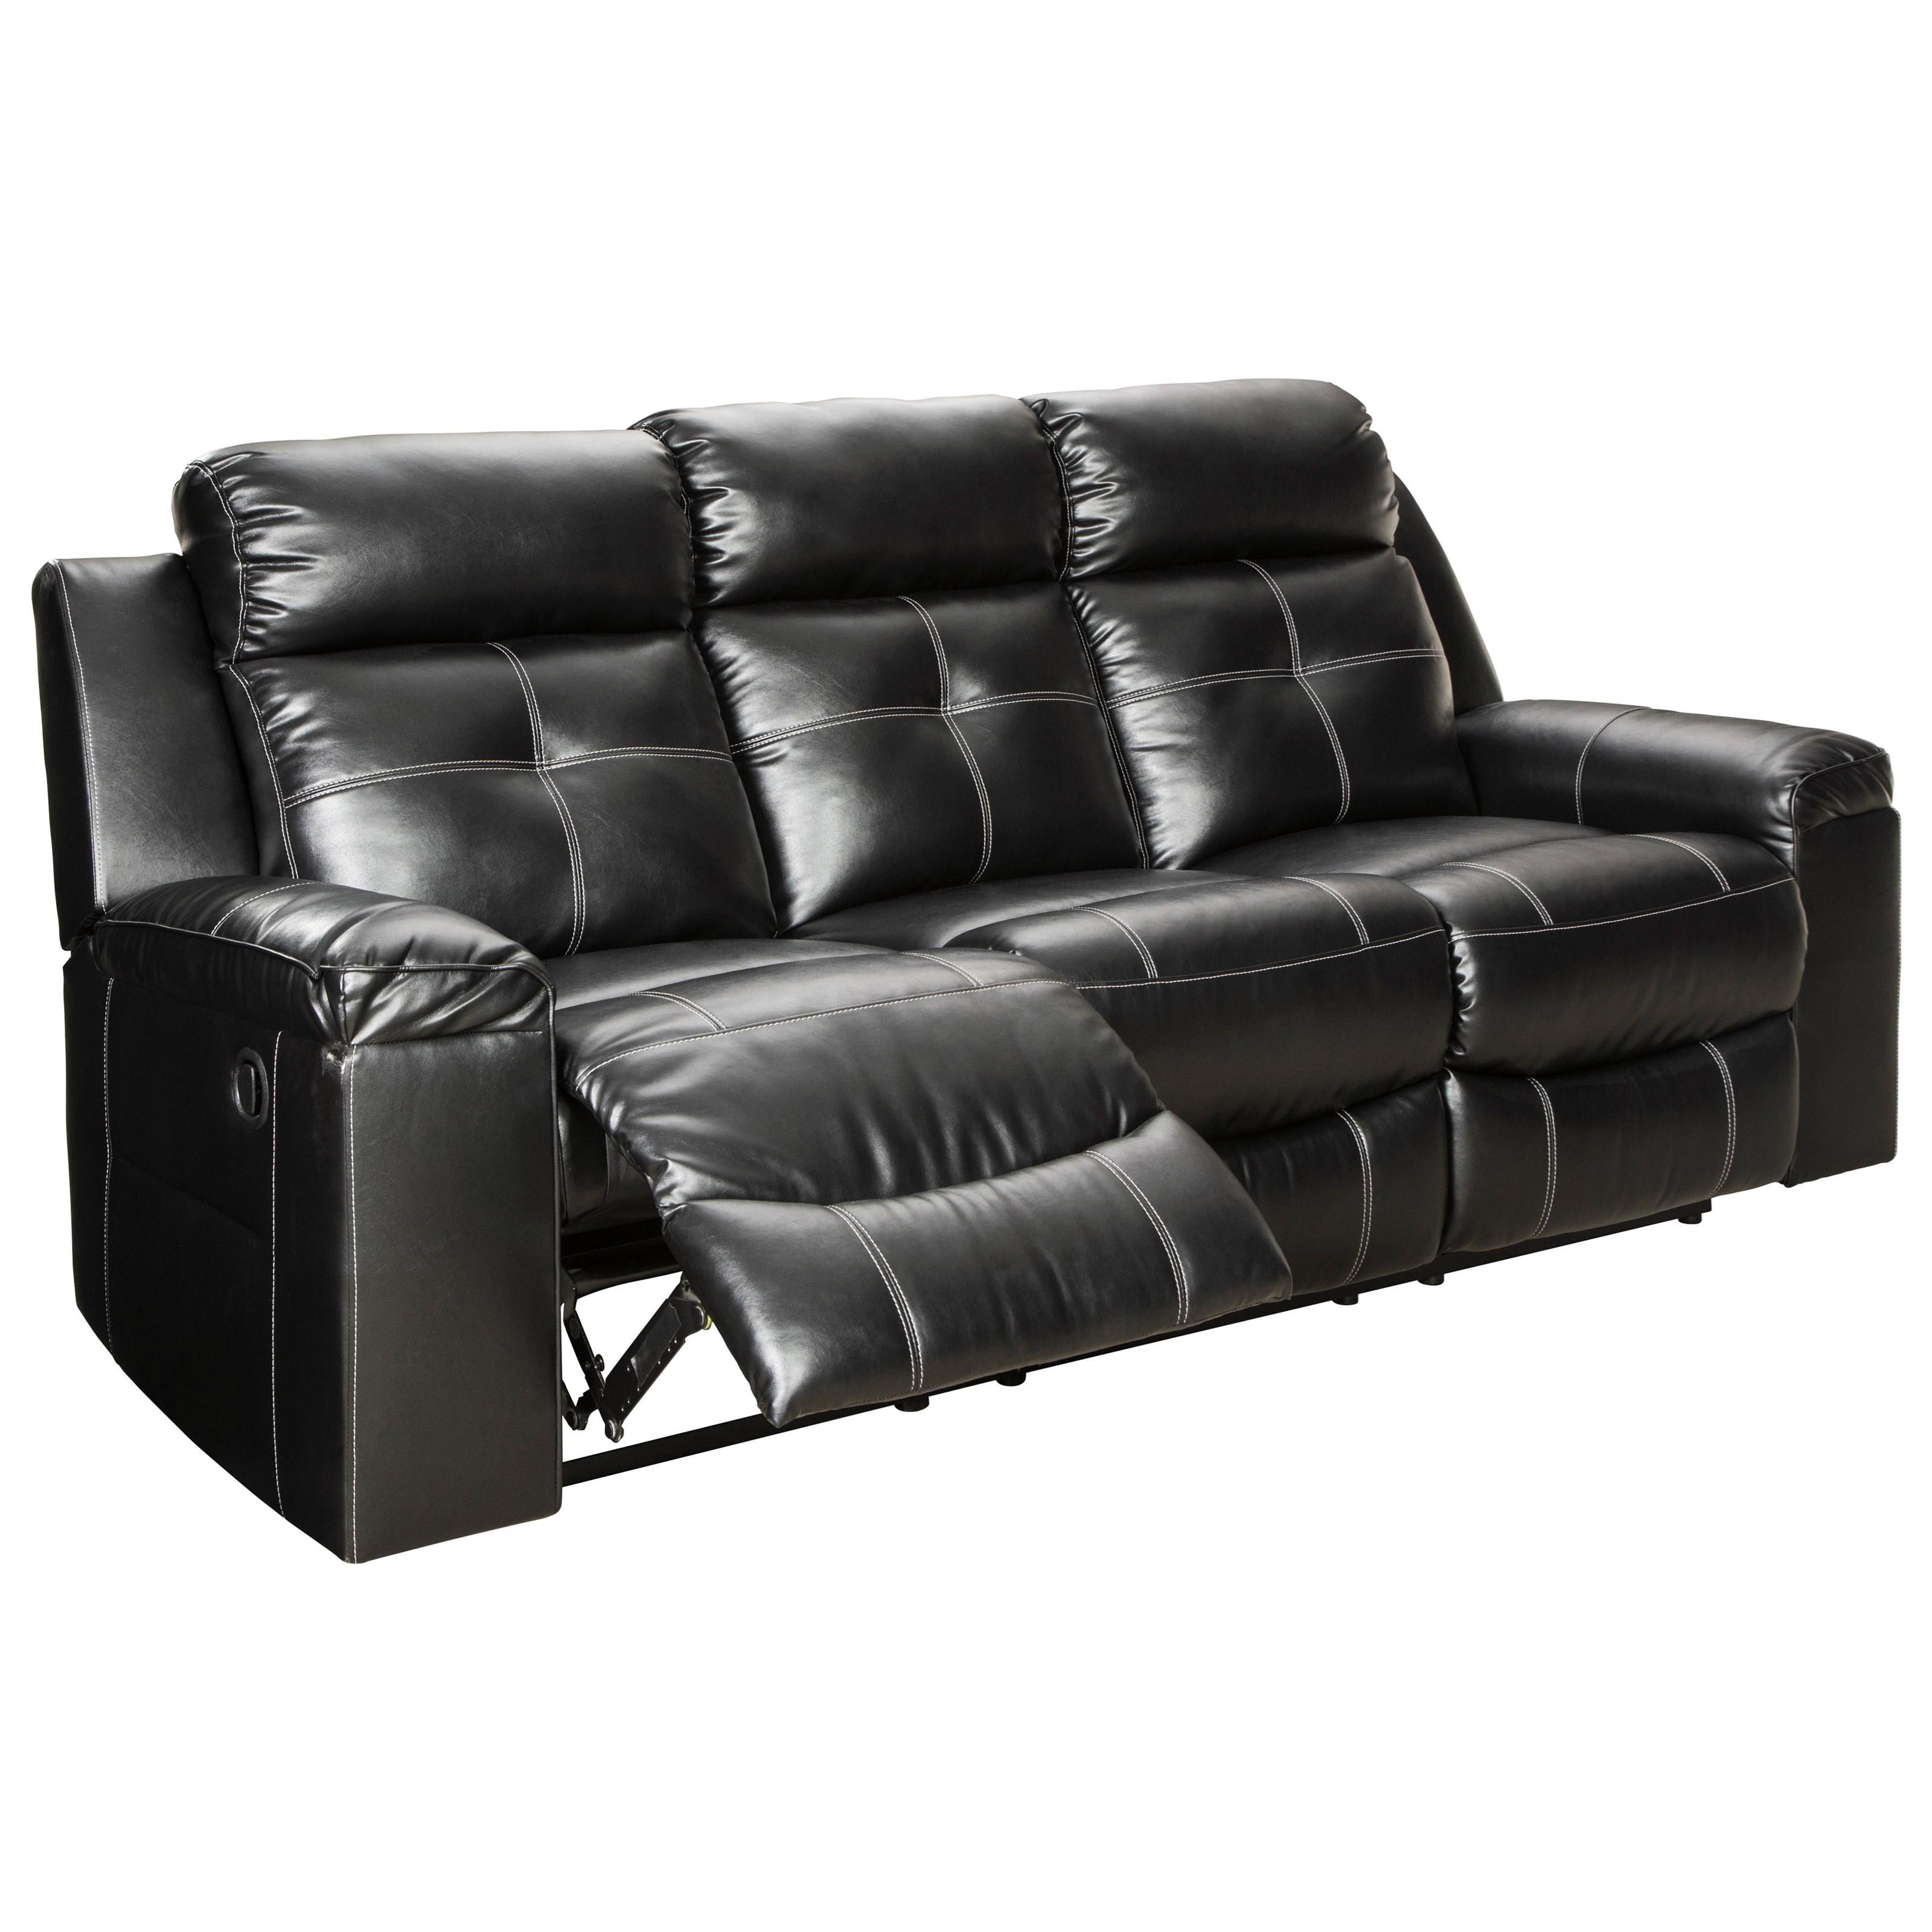 Kempten Reclining Sofa by Ashley (Signature Design) at Johnny Janosik